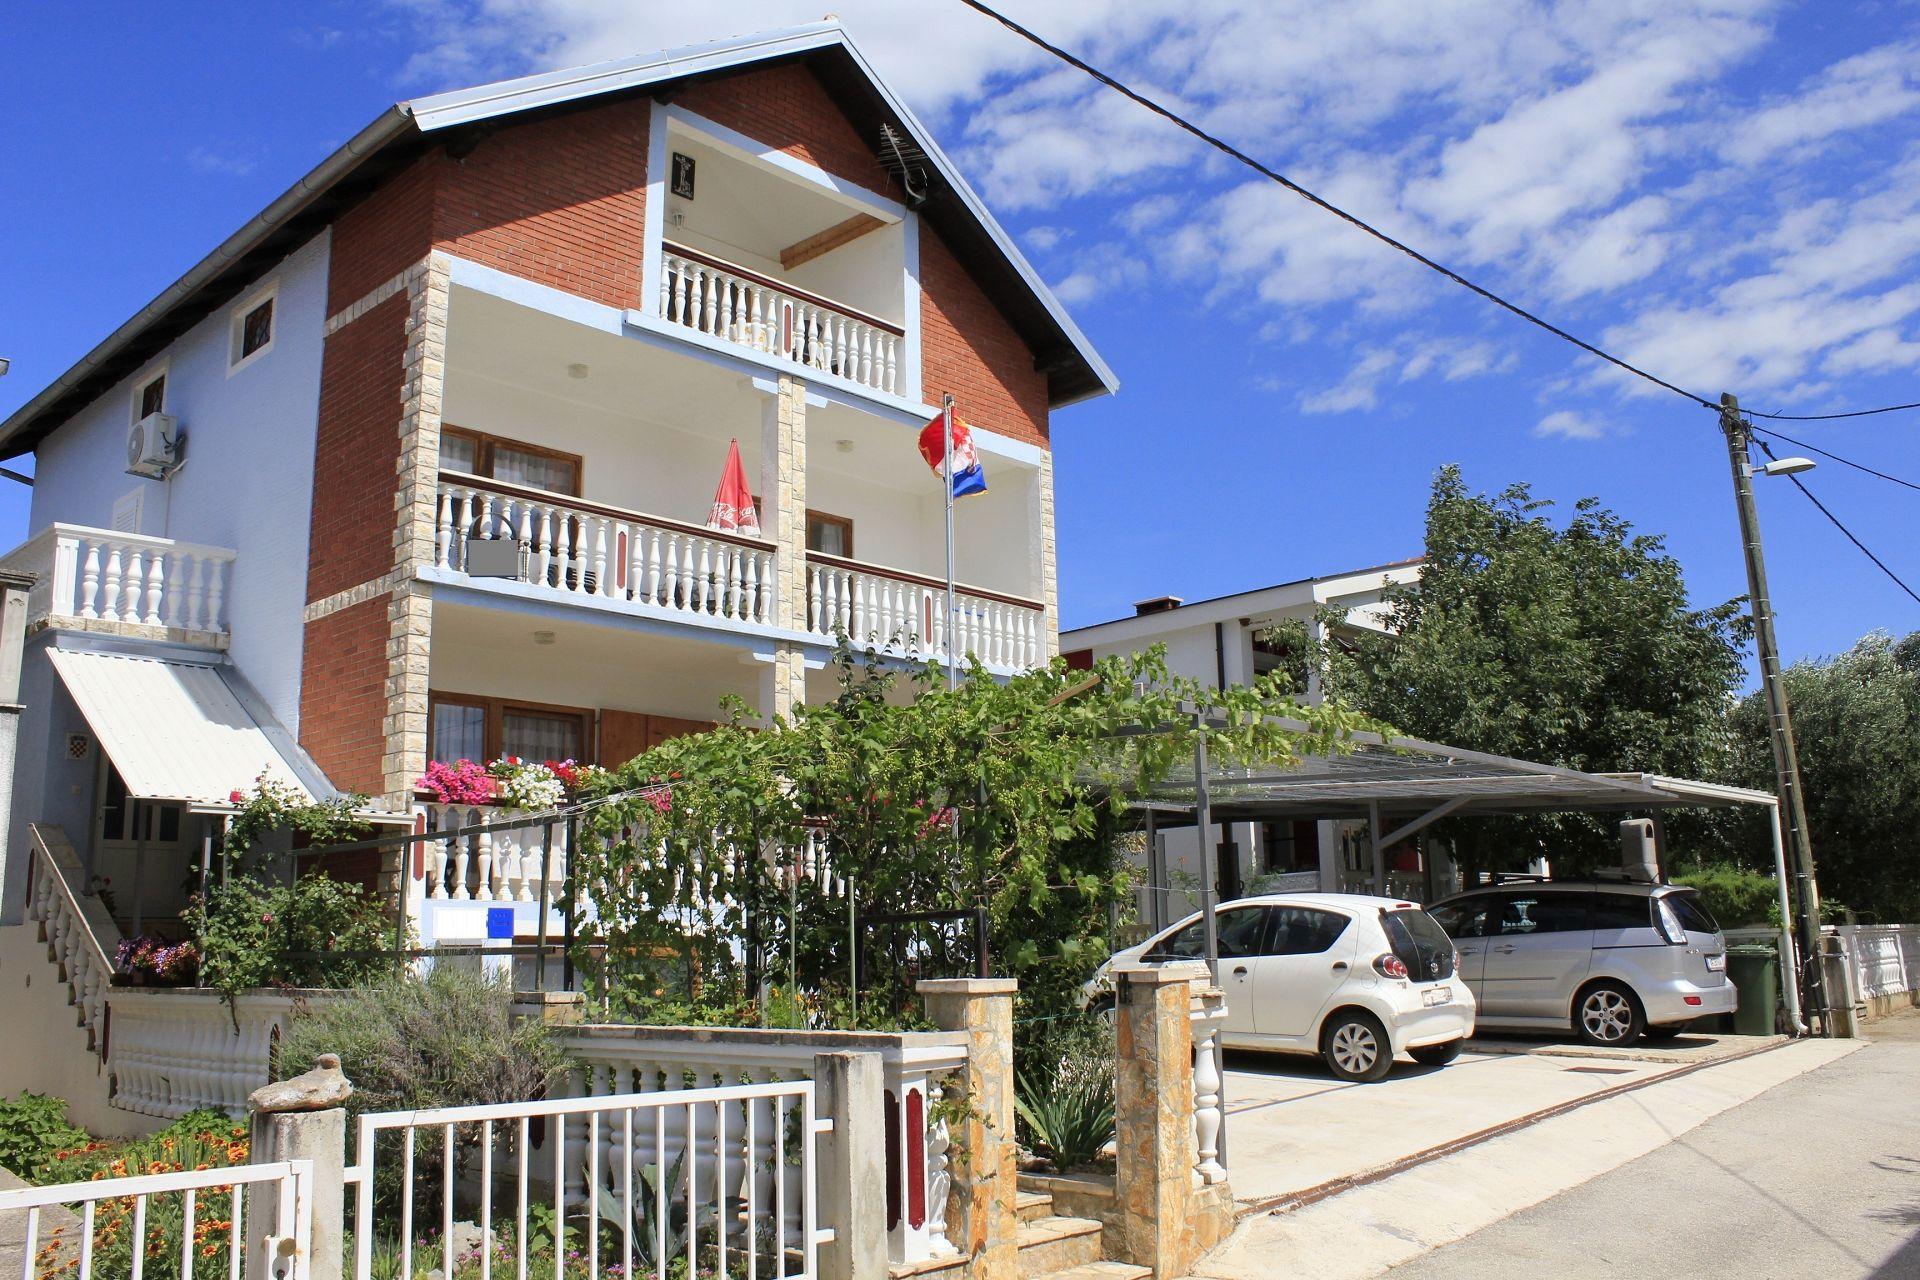 Apartamente Apartment Mato A1 Crna Punta, Zadar riviera 54181, Kruševo, , Rajoni i Splitit/Dalmacisë